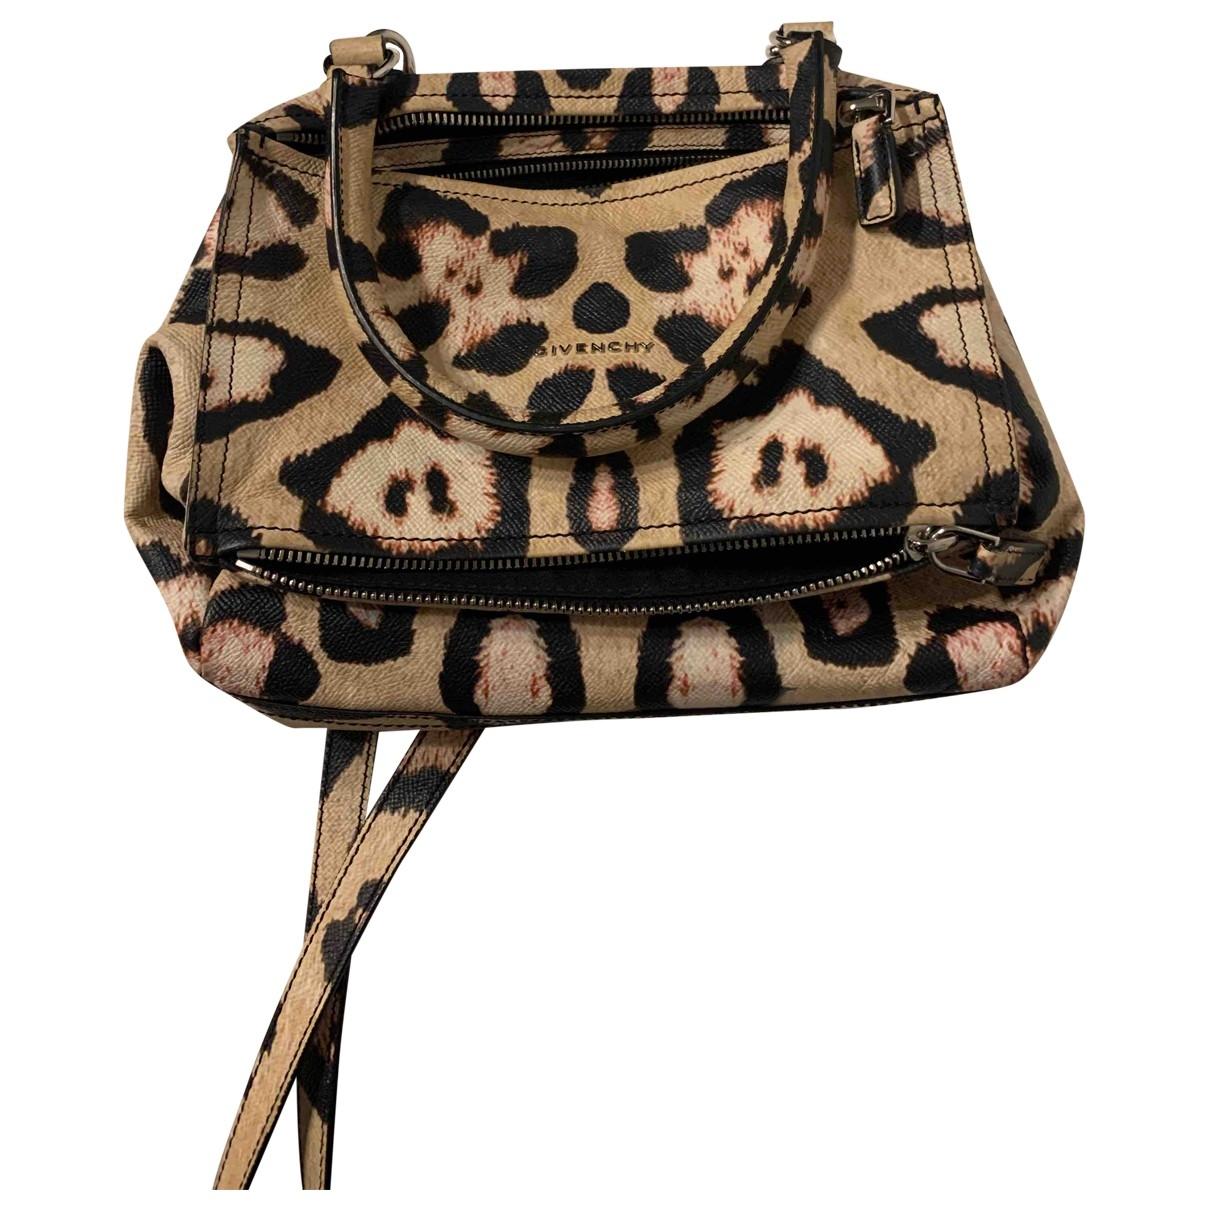 Givenchy Pandora Handtasche in  Beige Leder